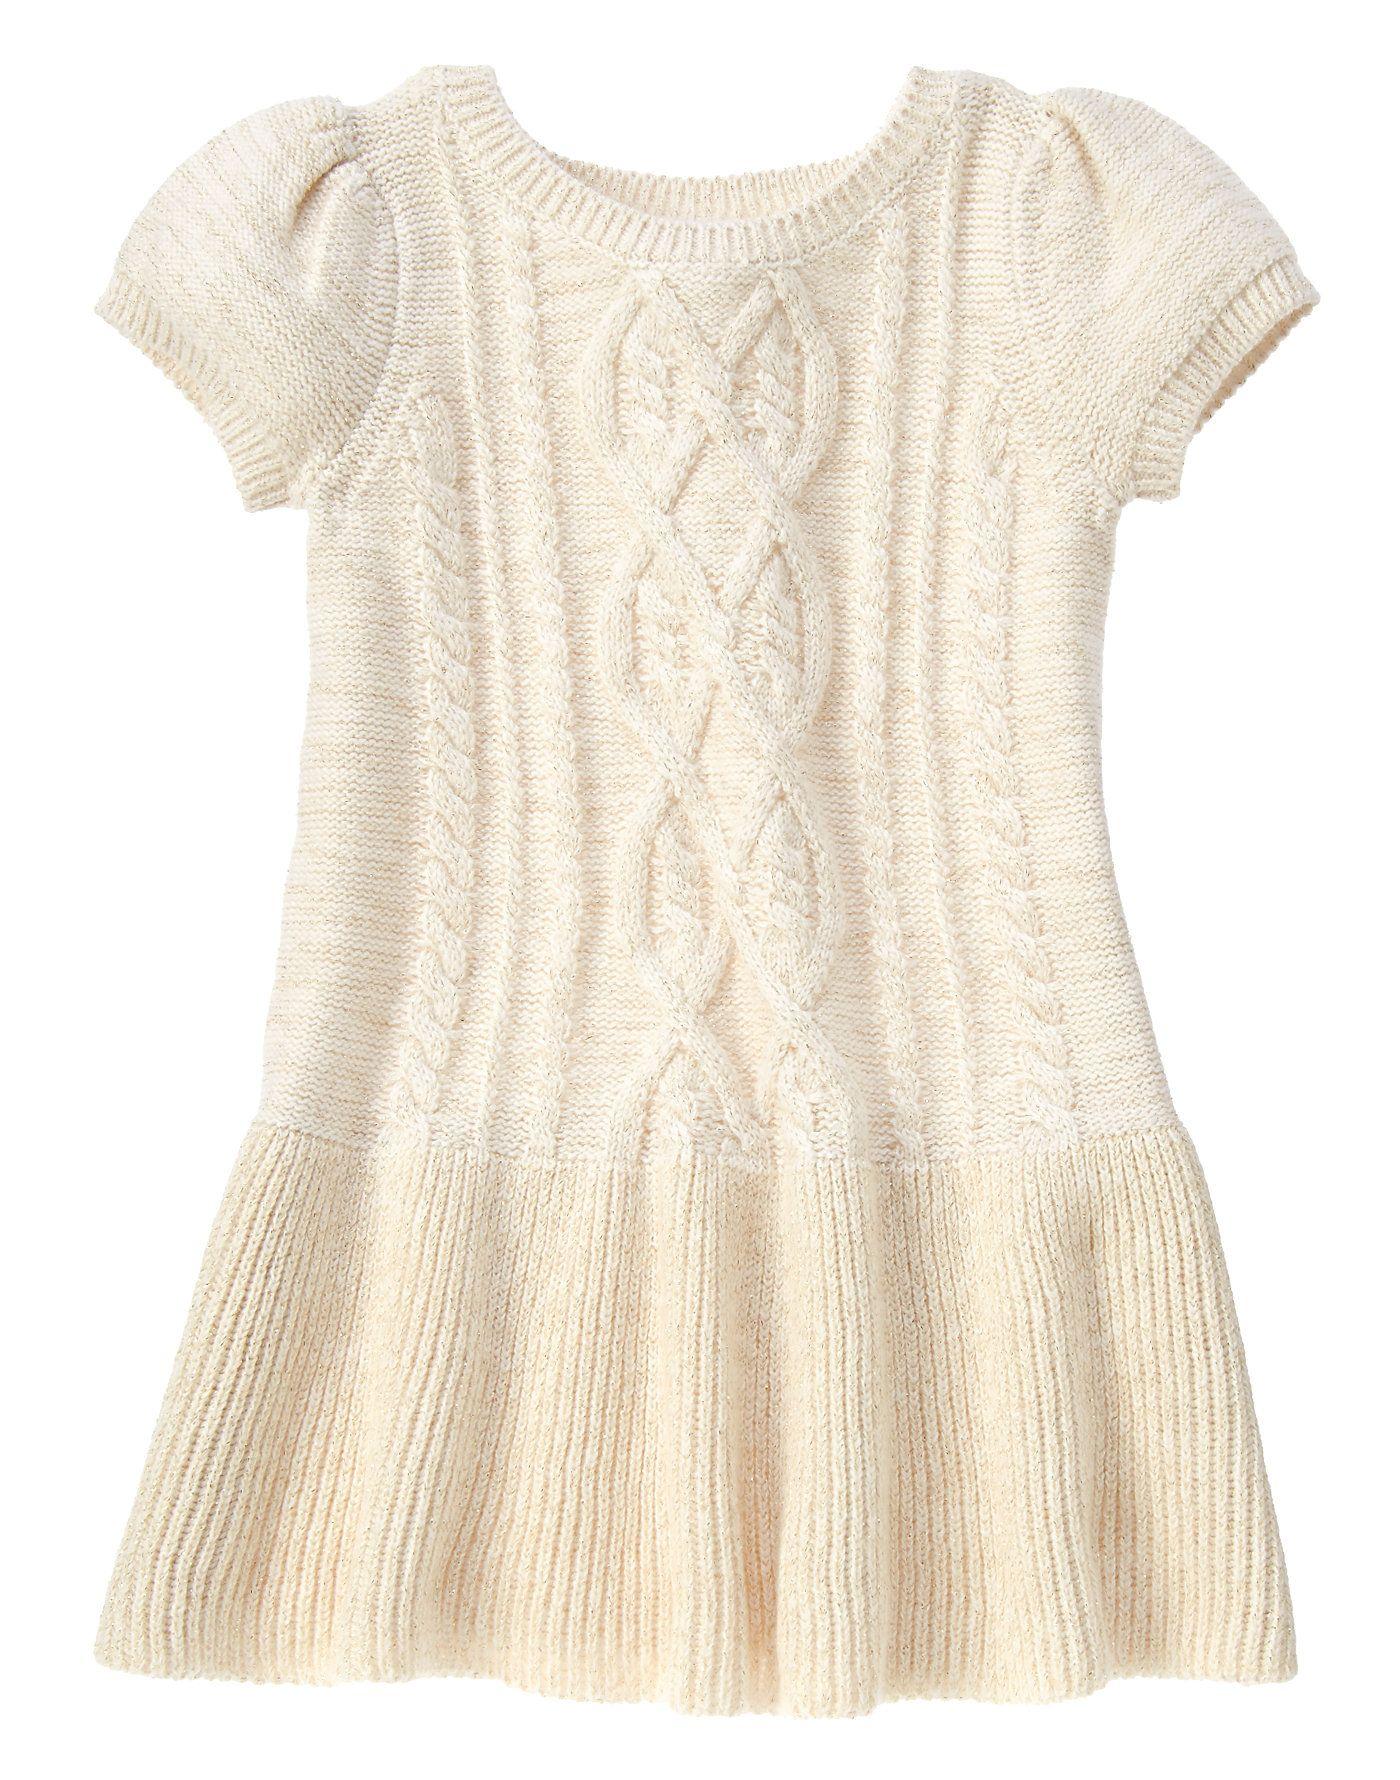 Cable-Knit Sweater Dress at Gymboree | Family Portrait- Lorelei ...